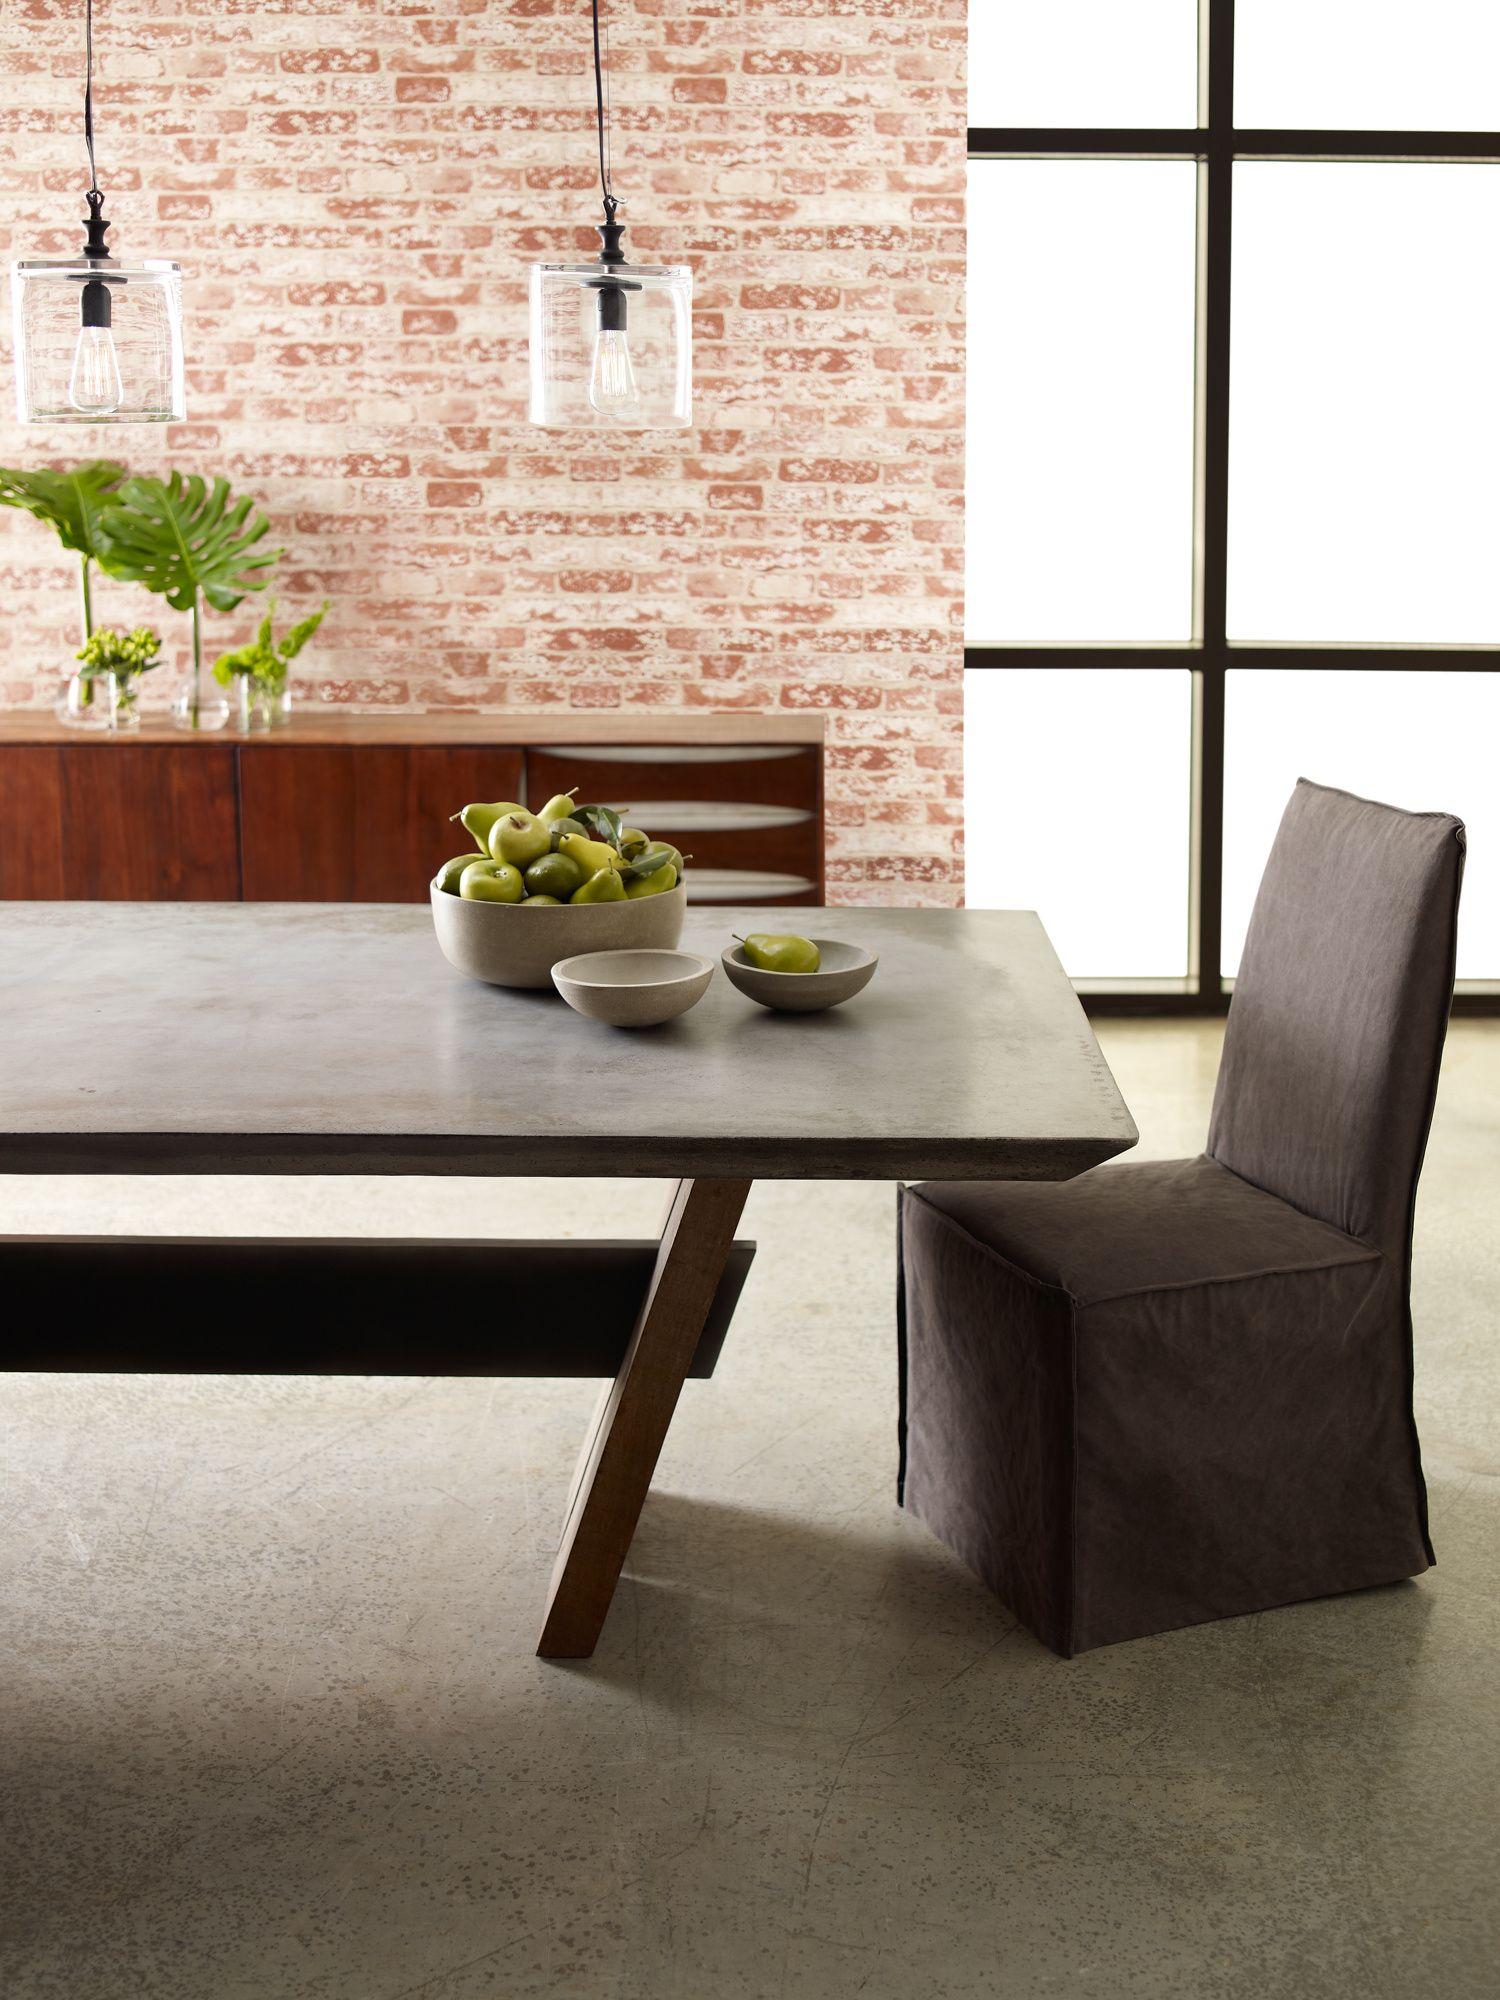 Four Hands At Gallatin Valley Furniture Carpet One Www Gvfc1 Com Furniture Indoor Decor Modern Furnishings [ 2000 x 1500 Pixel ]